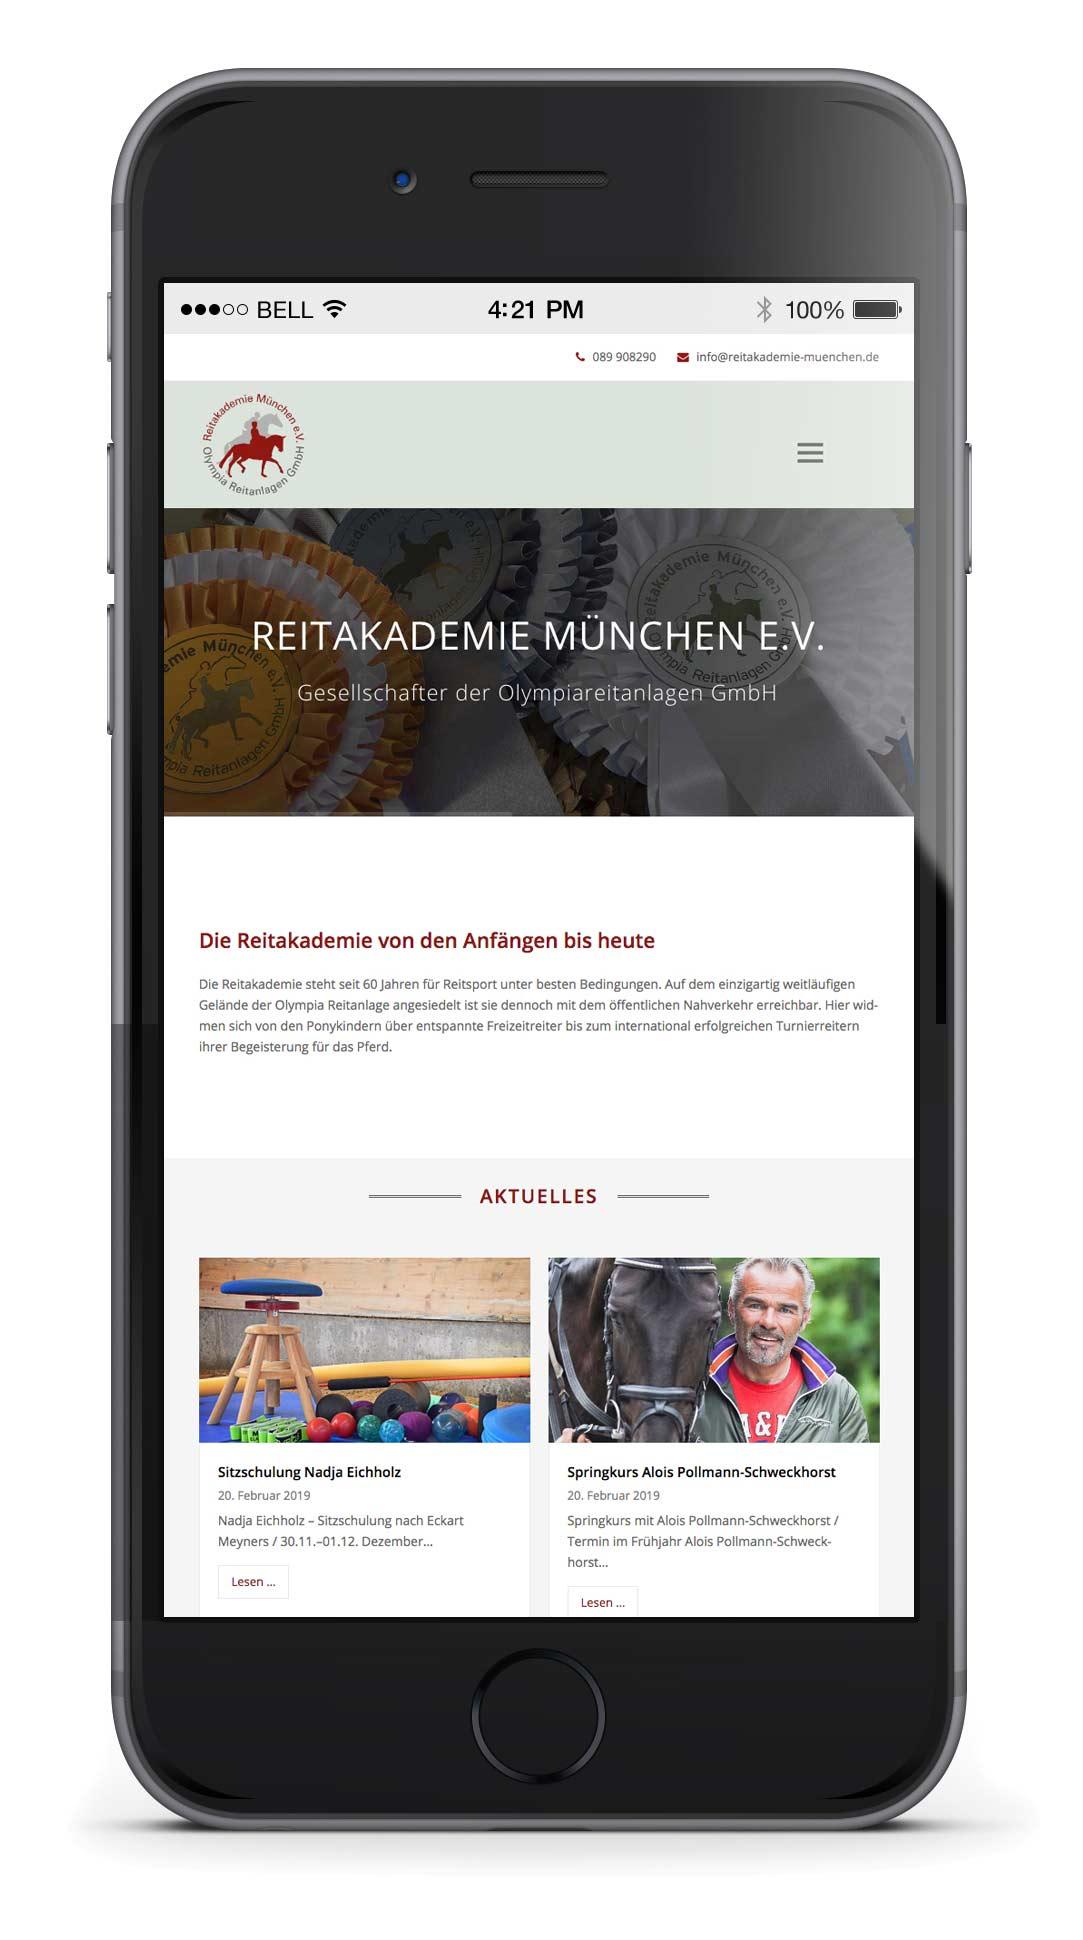 reitakademie-muenchen-de-titel-mobil